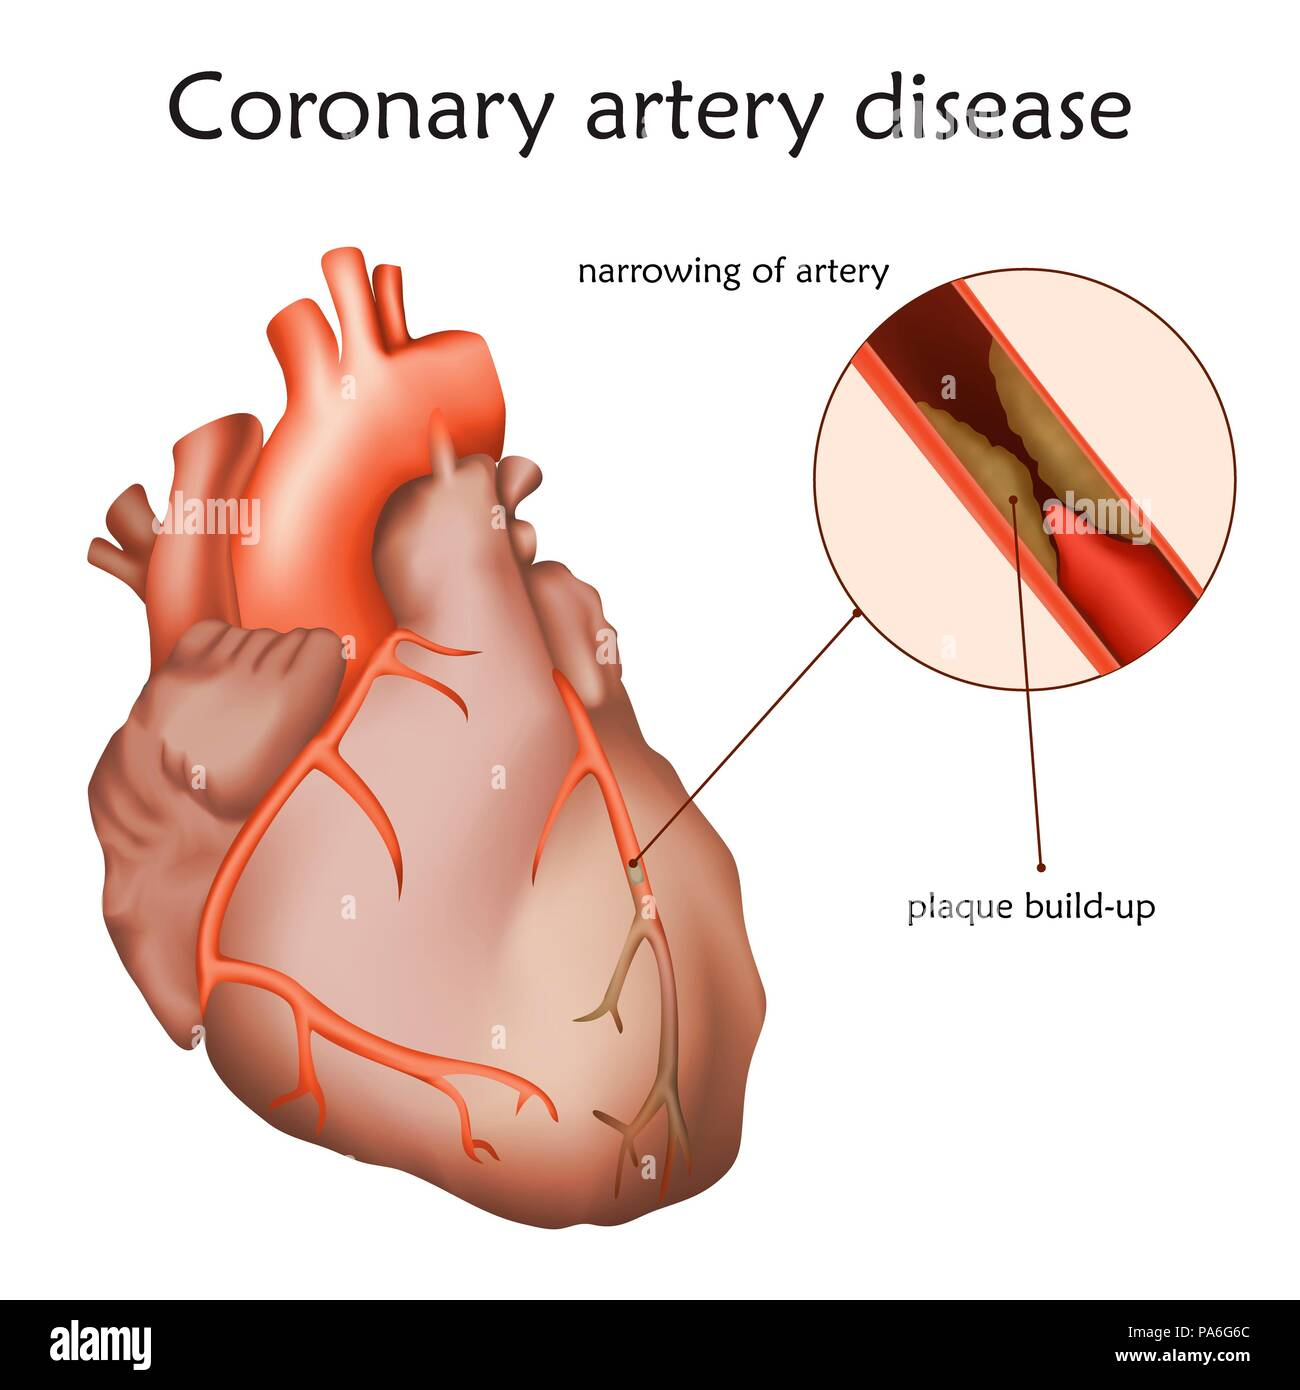 Coronary artery disease, illustration. A blocked coronary artery has led to heart muscle damage. - Stock Image